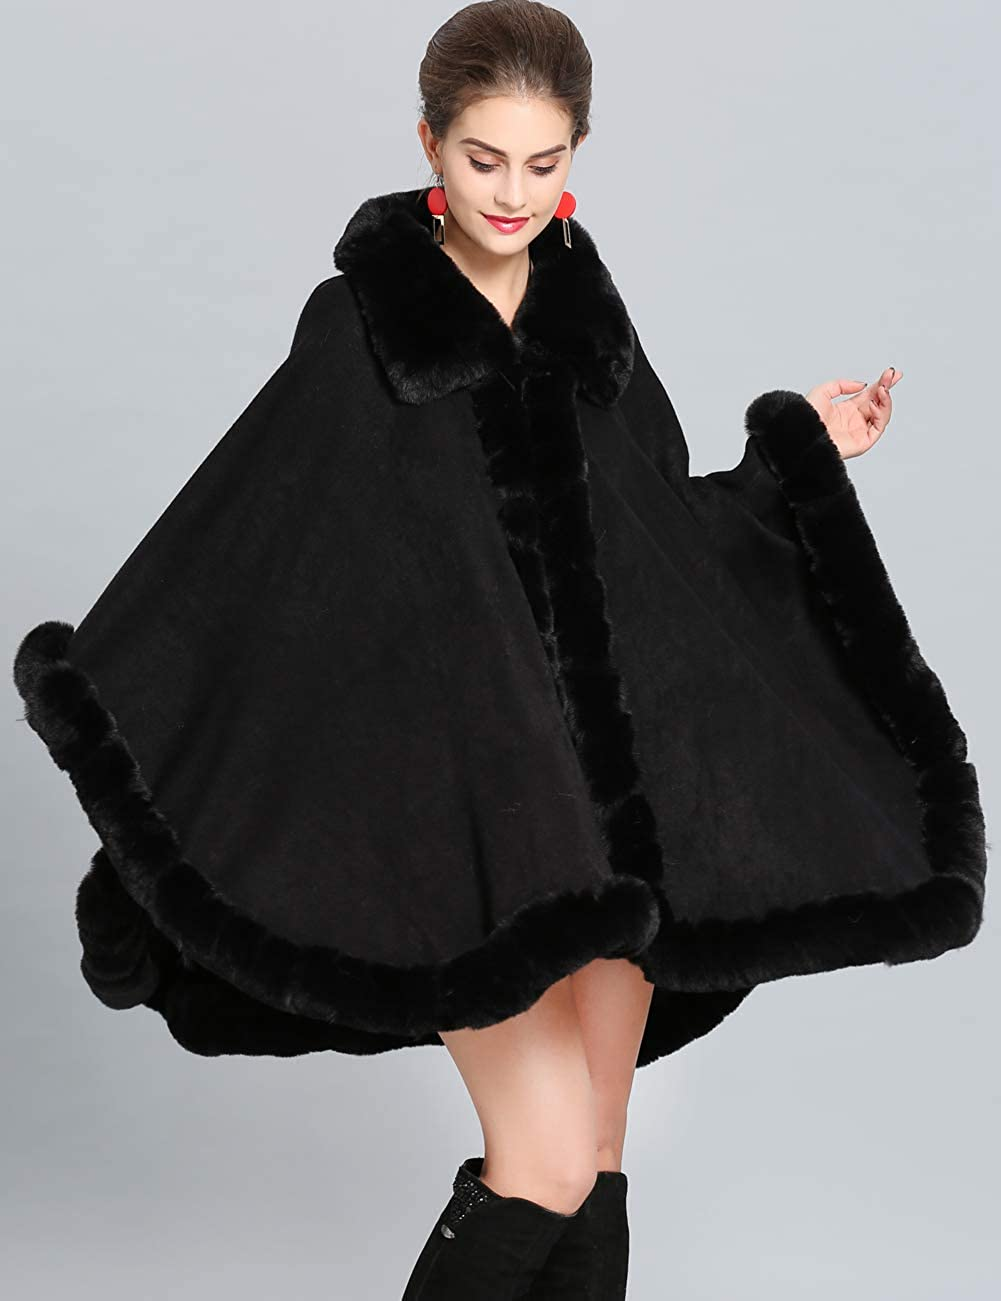 3a0645c1677 Aphratti Women s Wrap Shawl Cape Coat with Luxury Faux Rex Rabbit Fur Collar  Without Arm Slits One Size Black at Amazon Women s Coats Shop